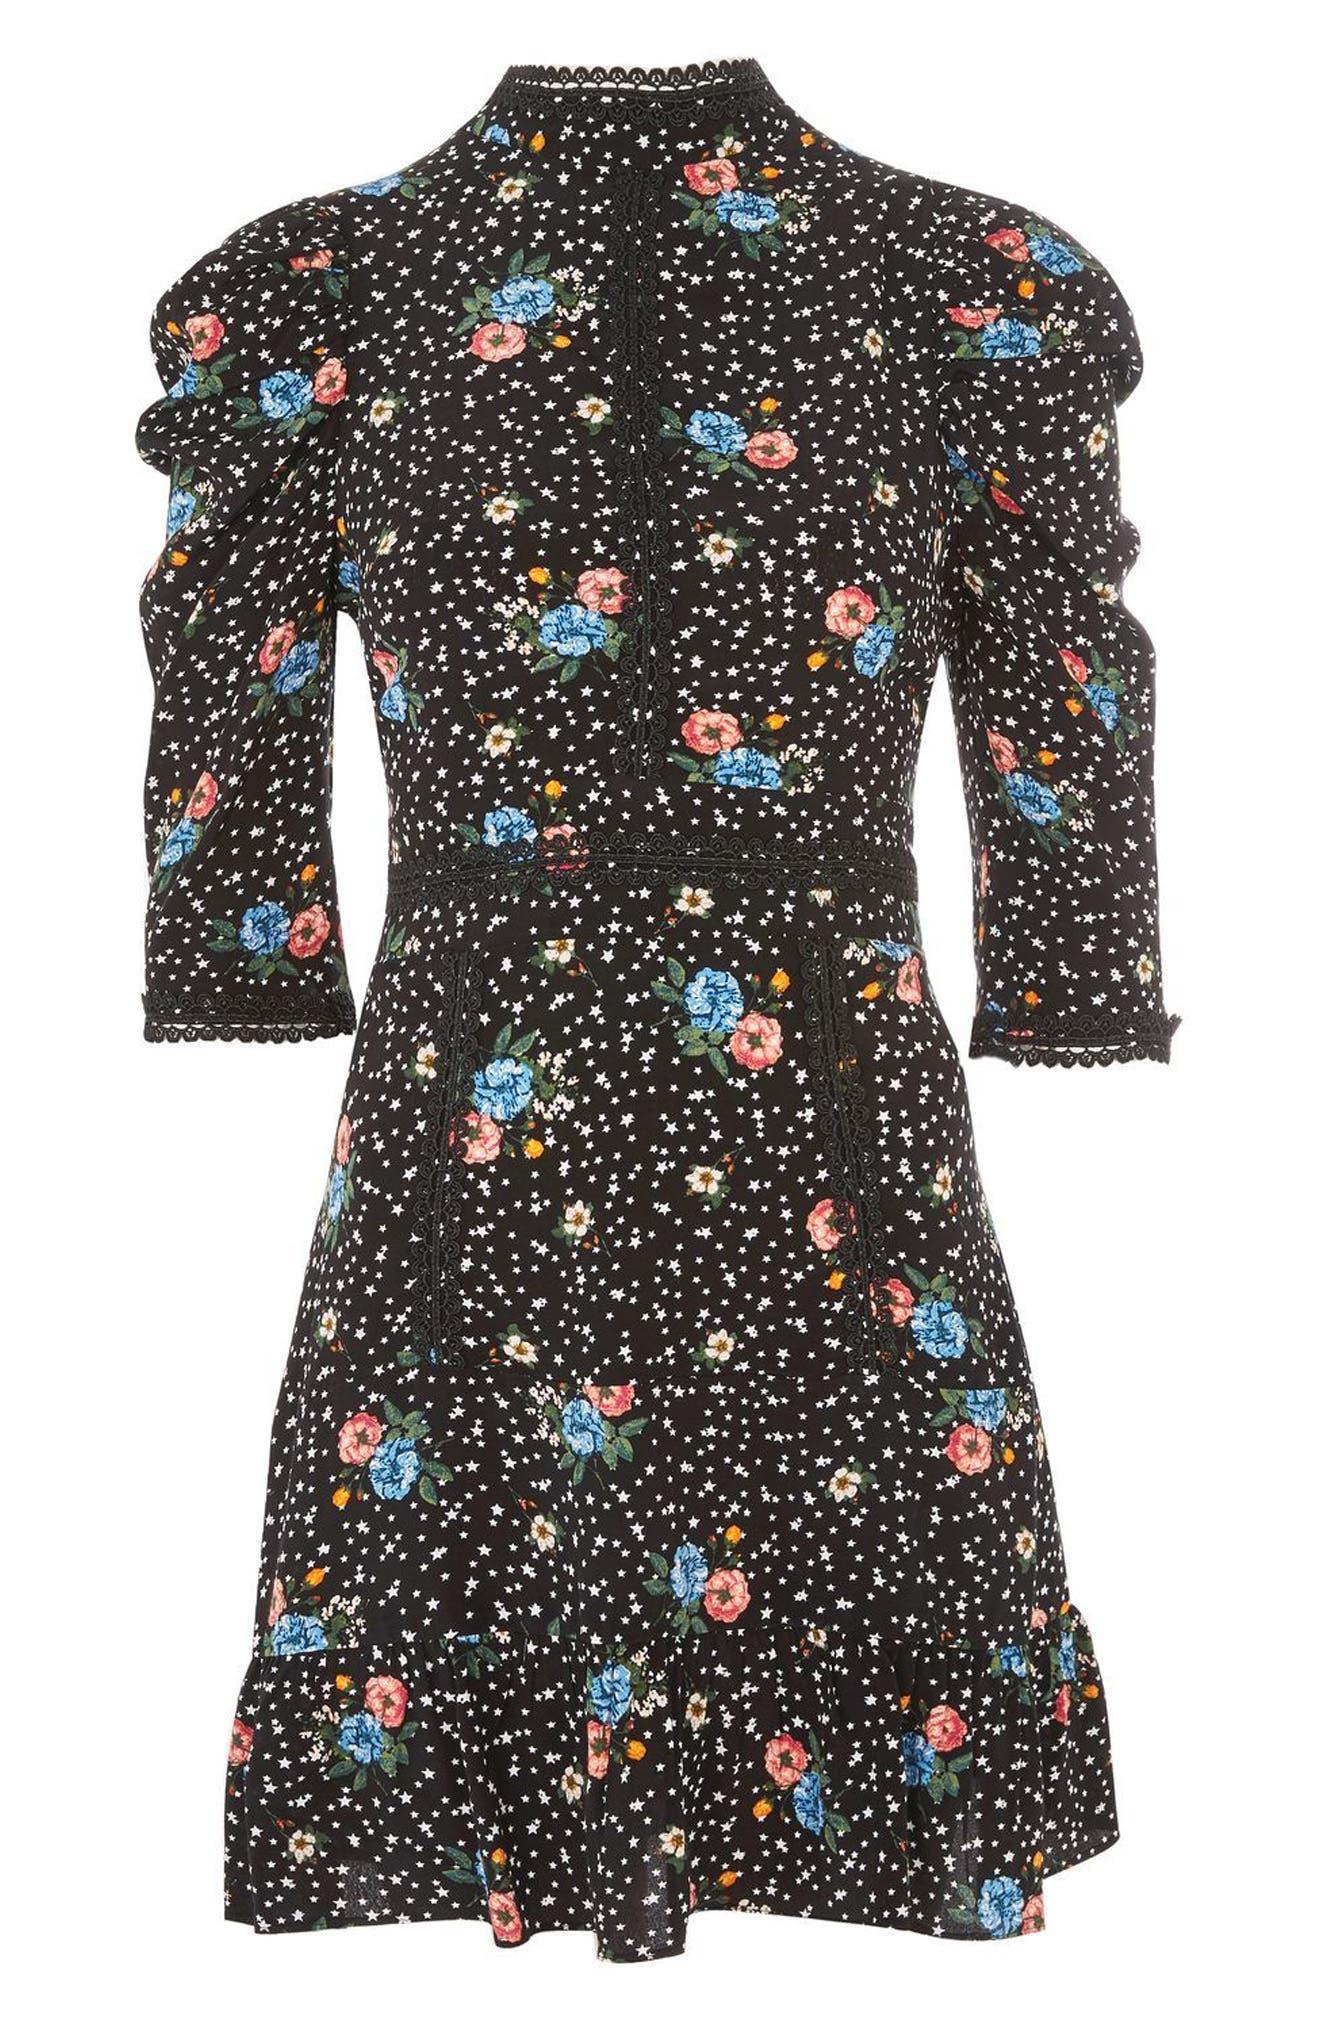 Lace-Up Back Floral Dress,                             Alternate thumbnail 4, color,                             Black Multi